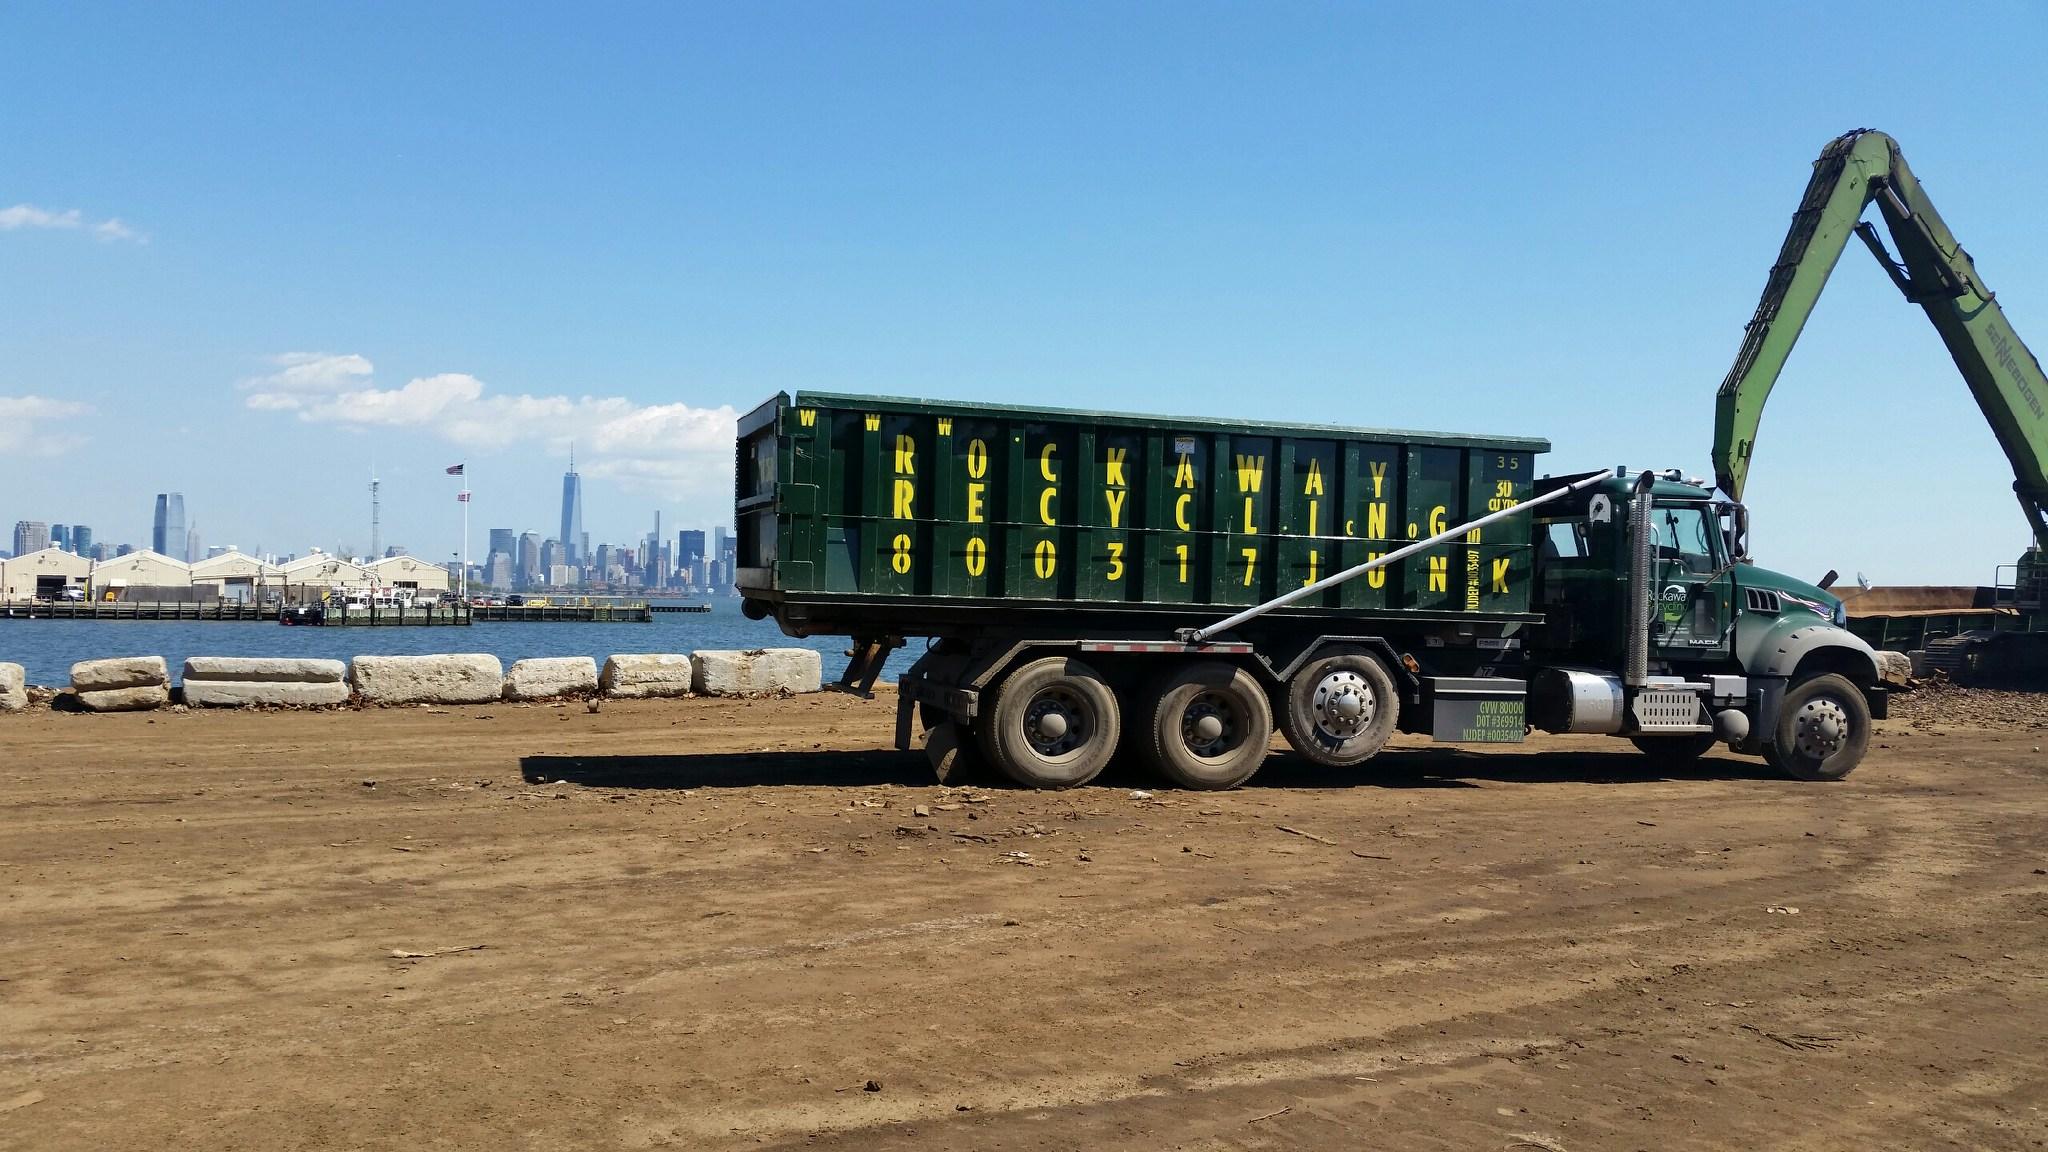 Rockaway Recycling - Scrap Metal Prices & New Jersey Scrap Yard